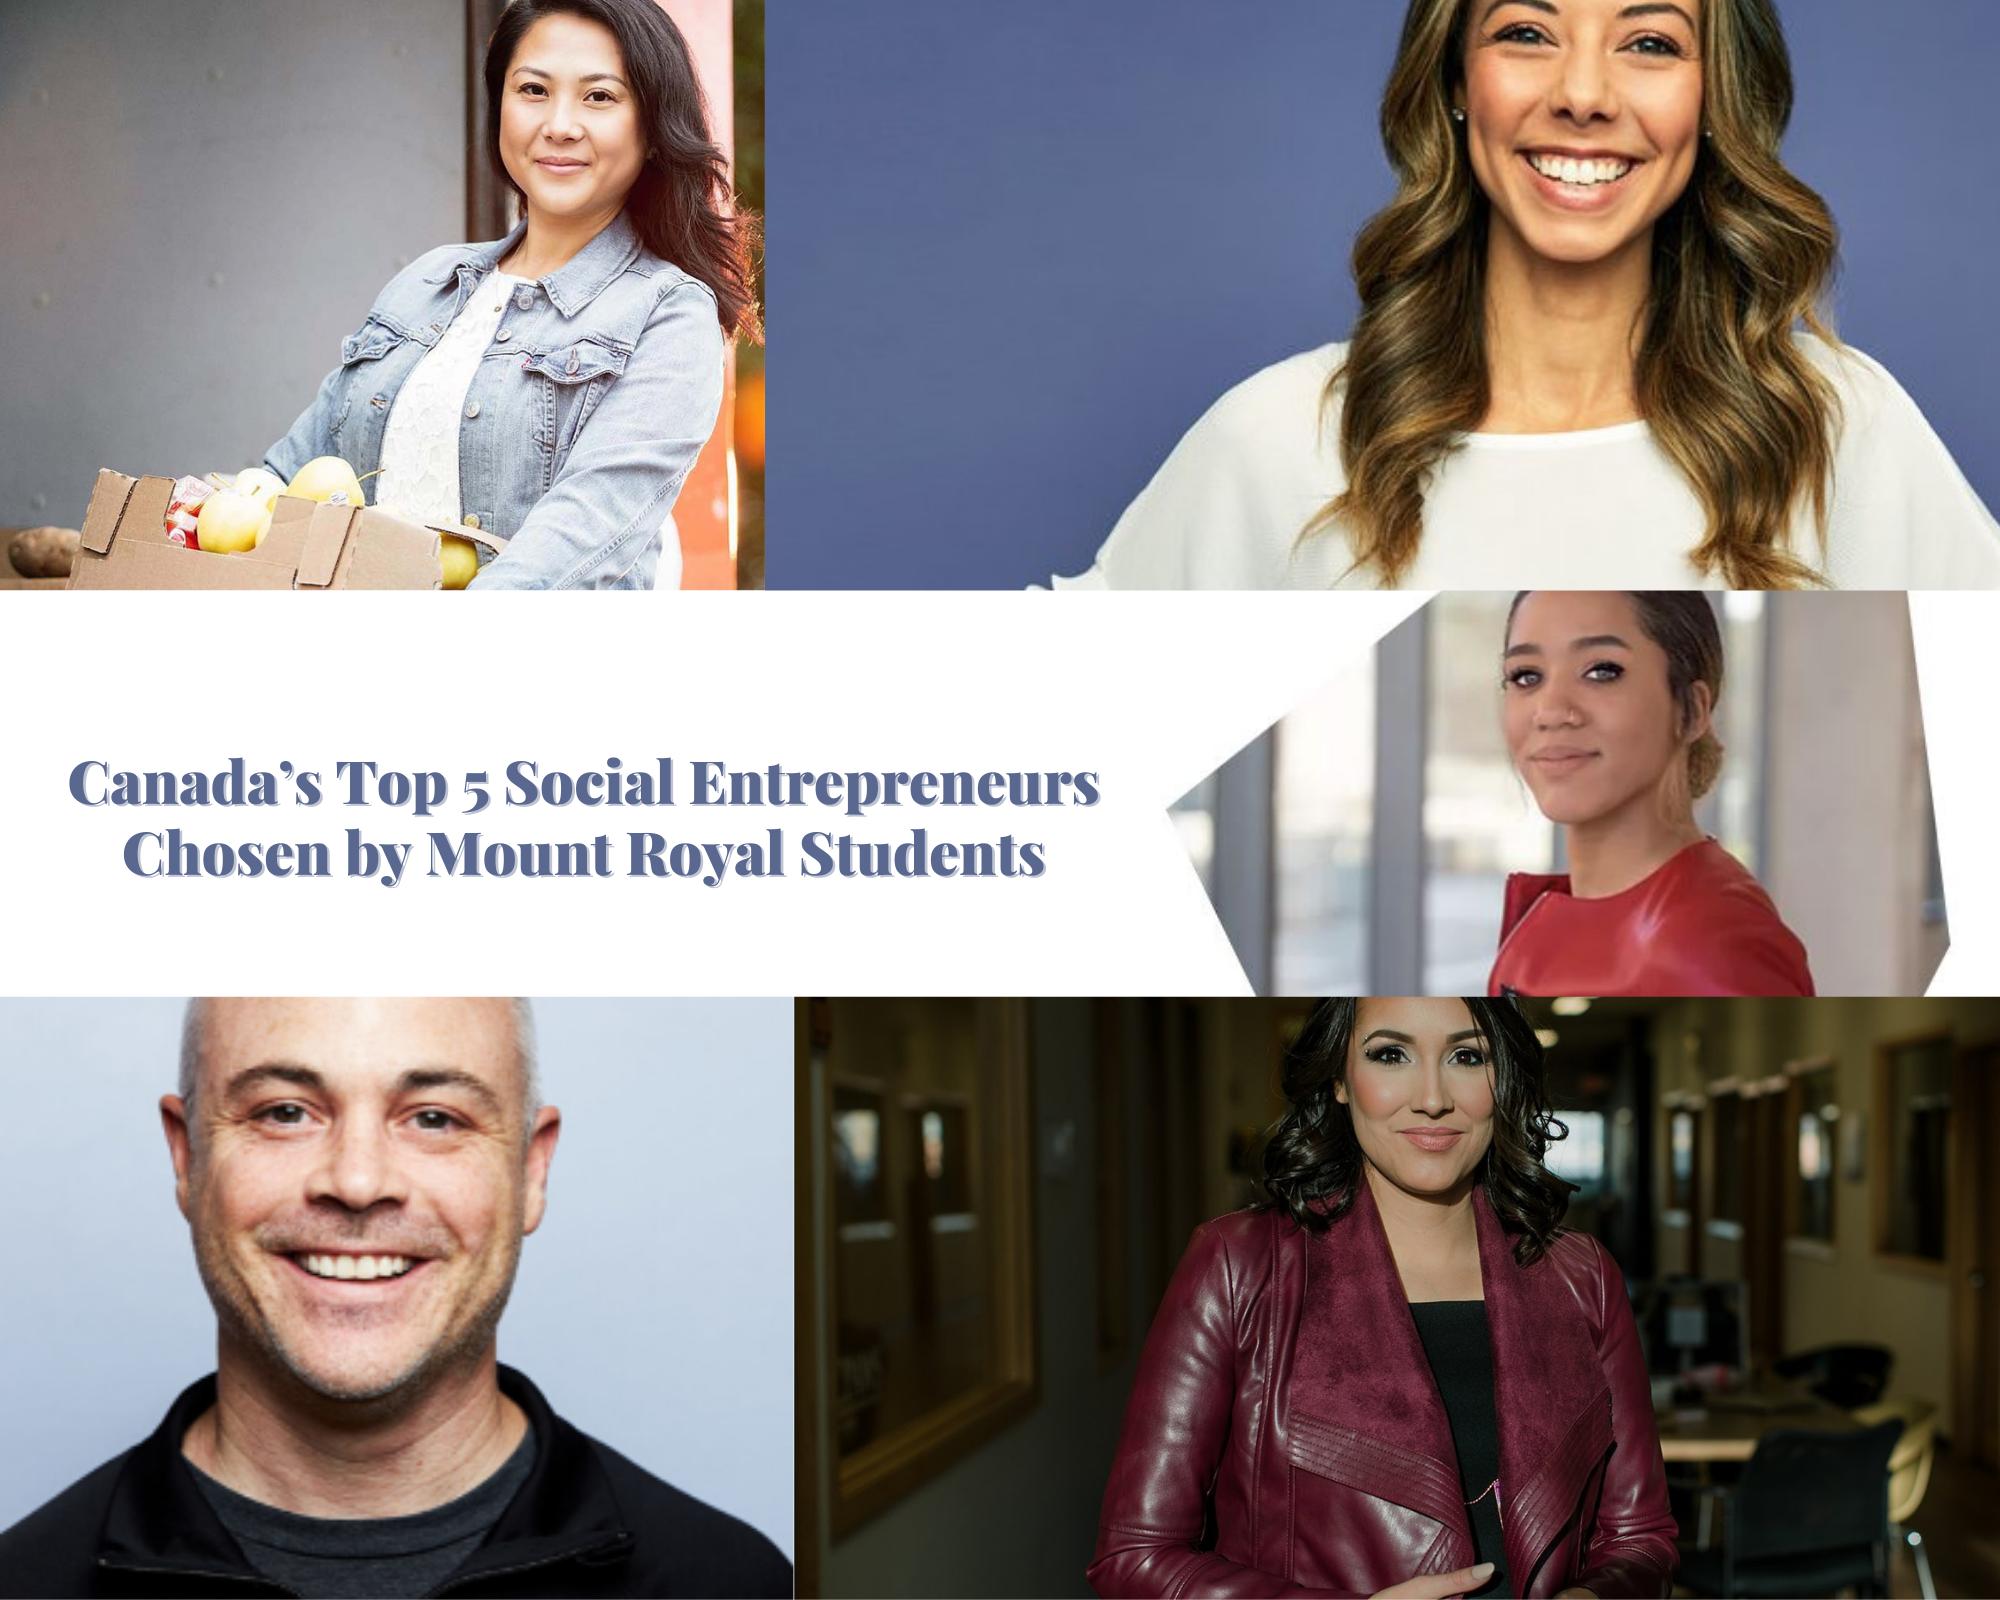 Canada's Top 5 Social Entrepreneurs Chosen by Mount Royal Students